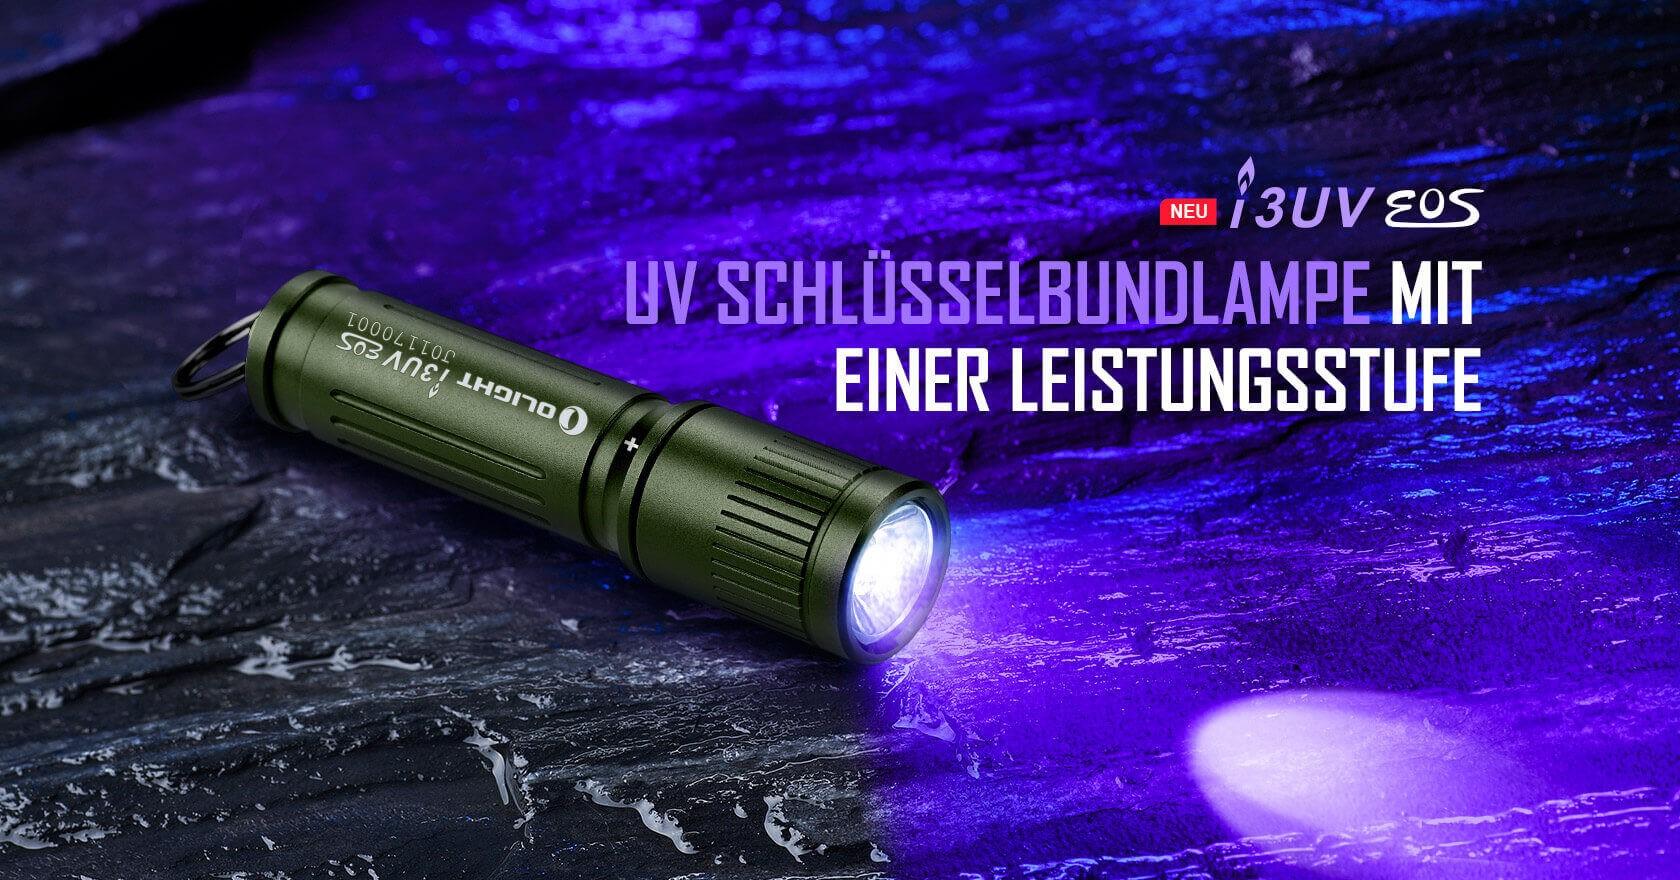 Olight i3UV EOS OD Green Taschenlampe